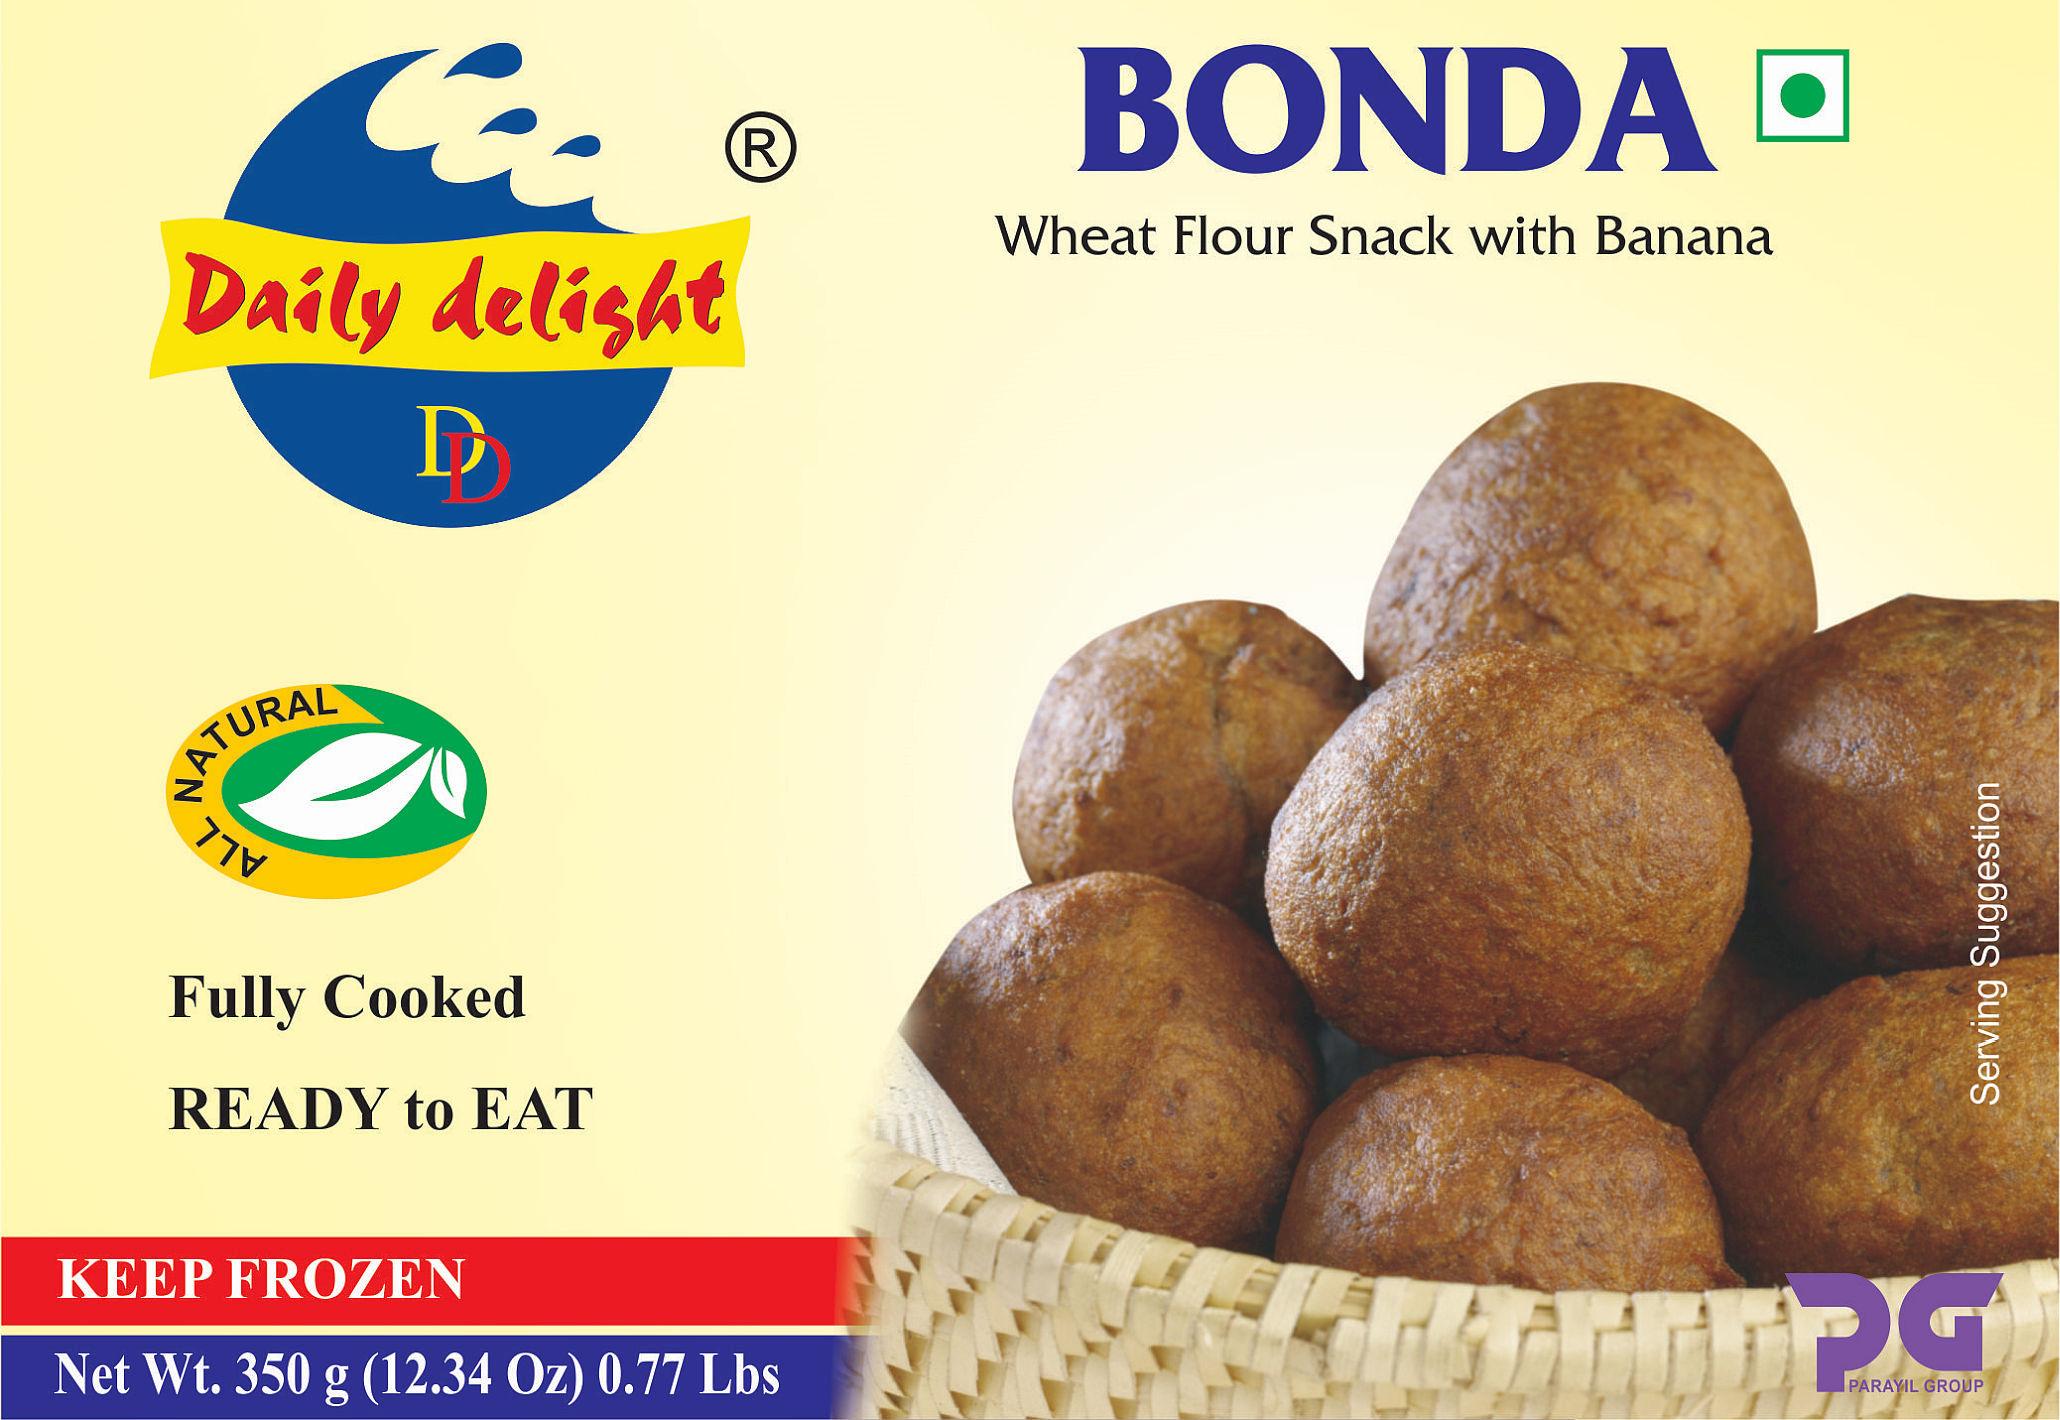 Daily Delight Bonda